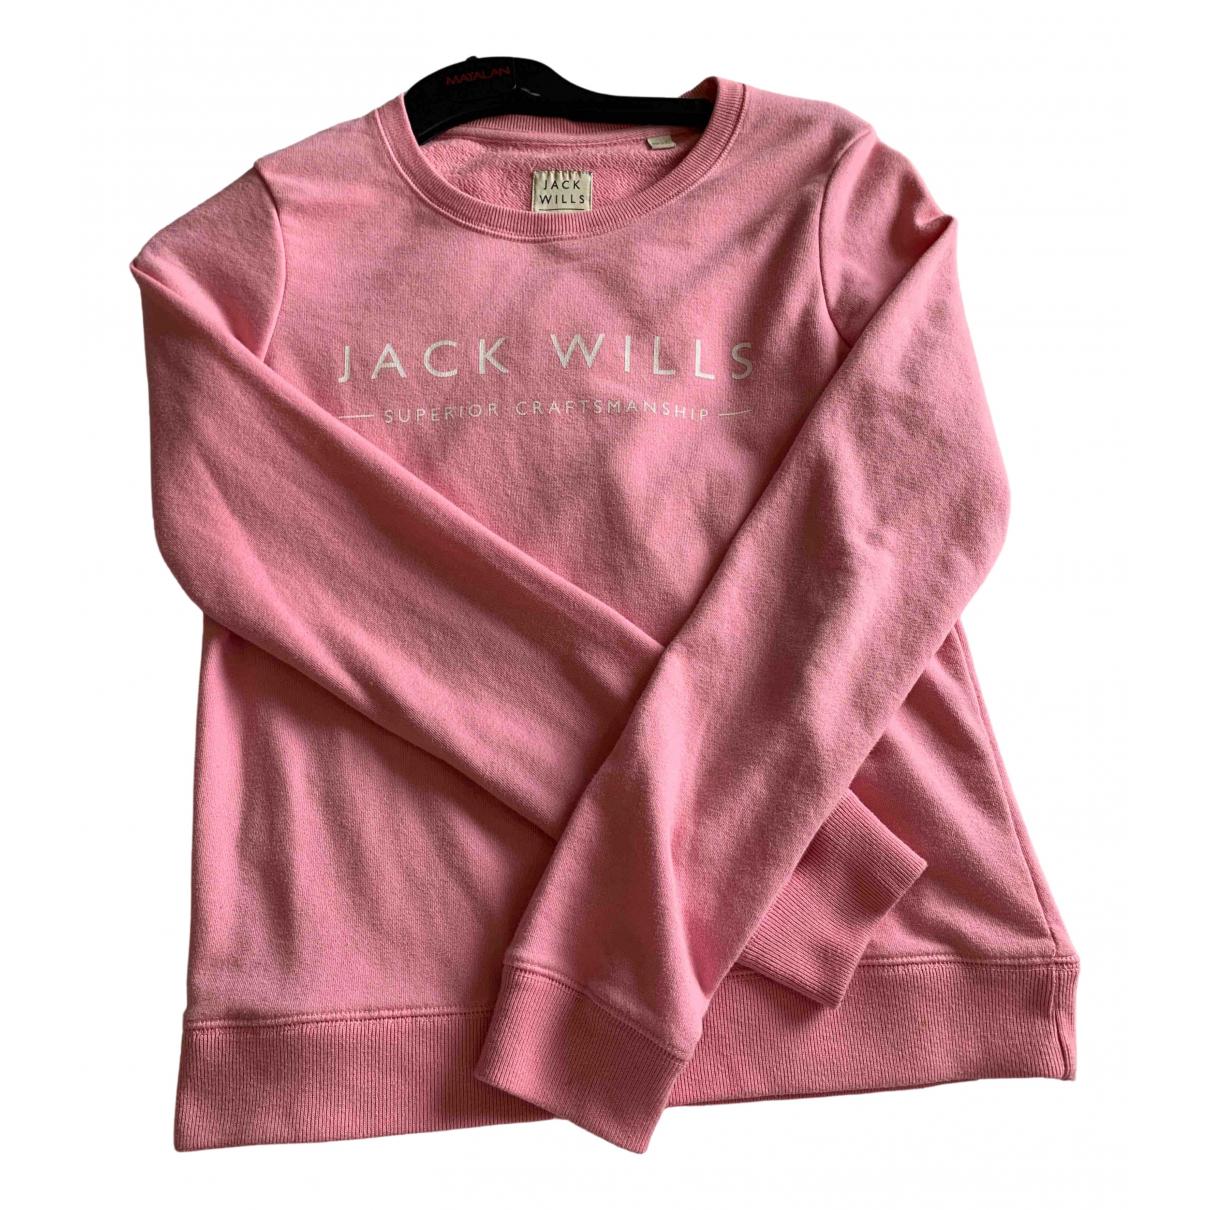 Jack Wills - Pull   pour femme en coton - rose